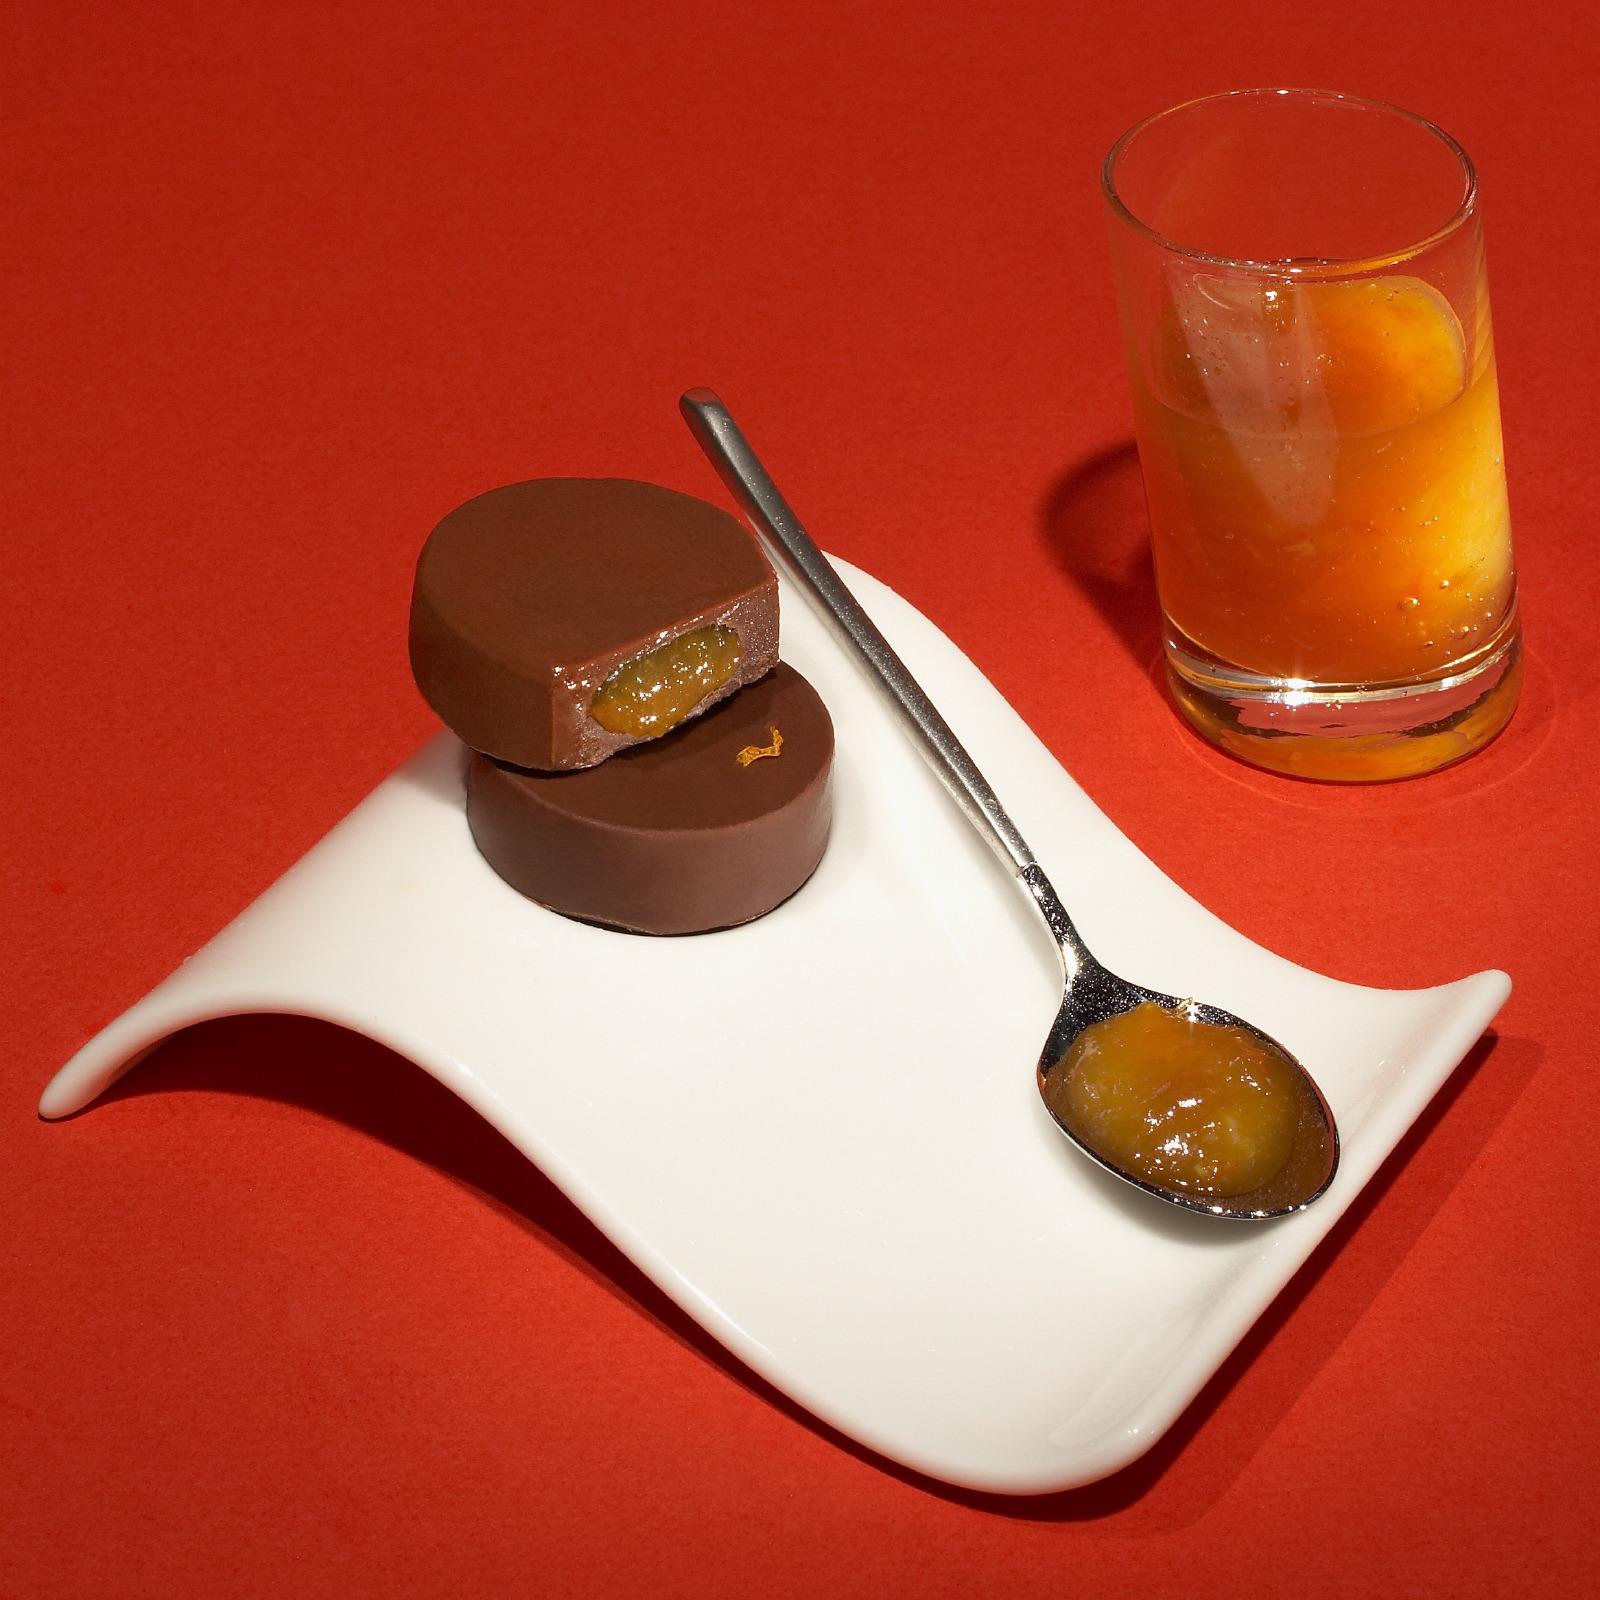 Nutella Sensations recipe book